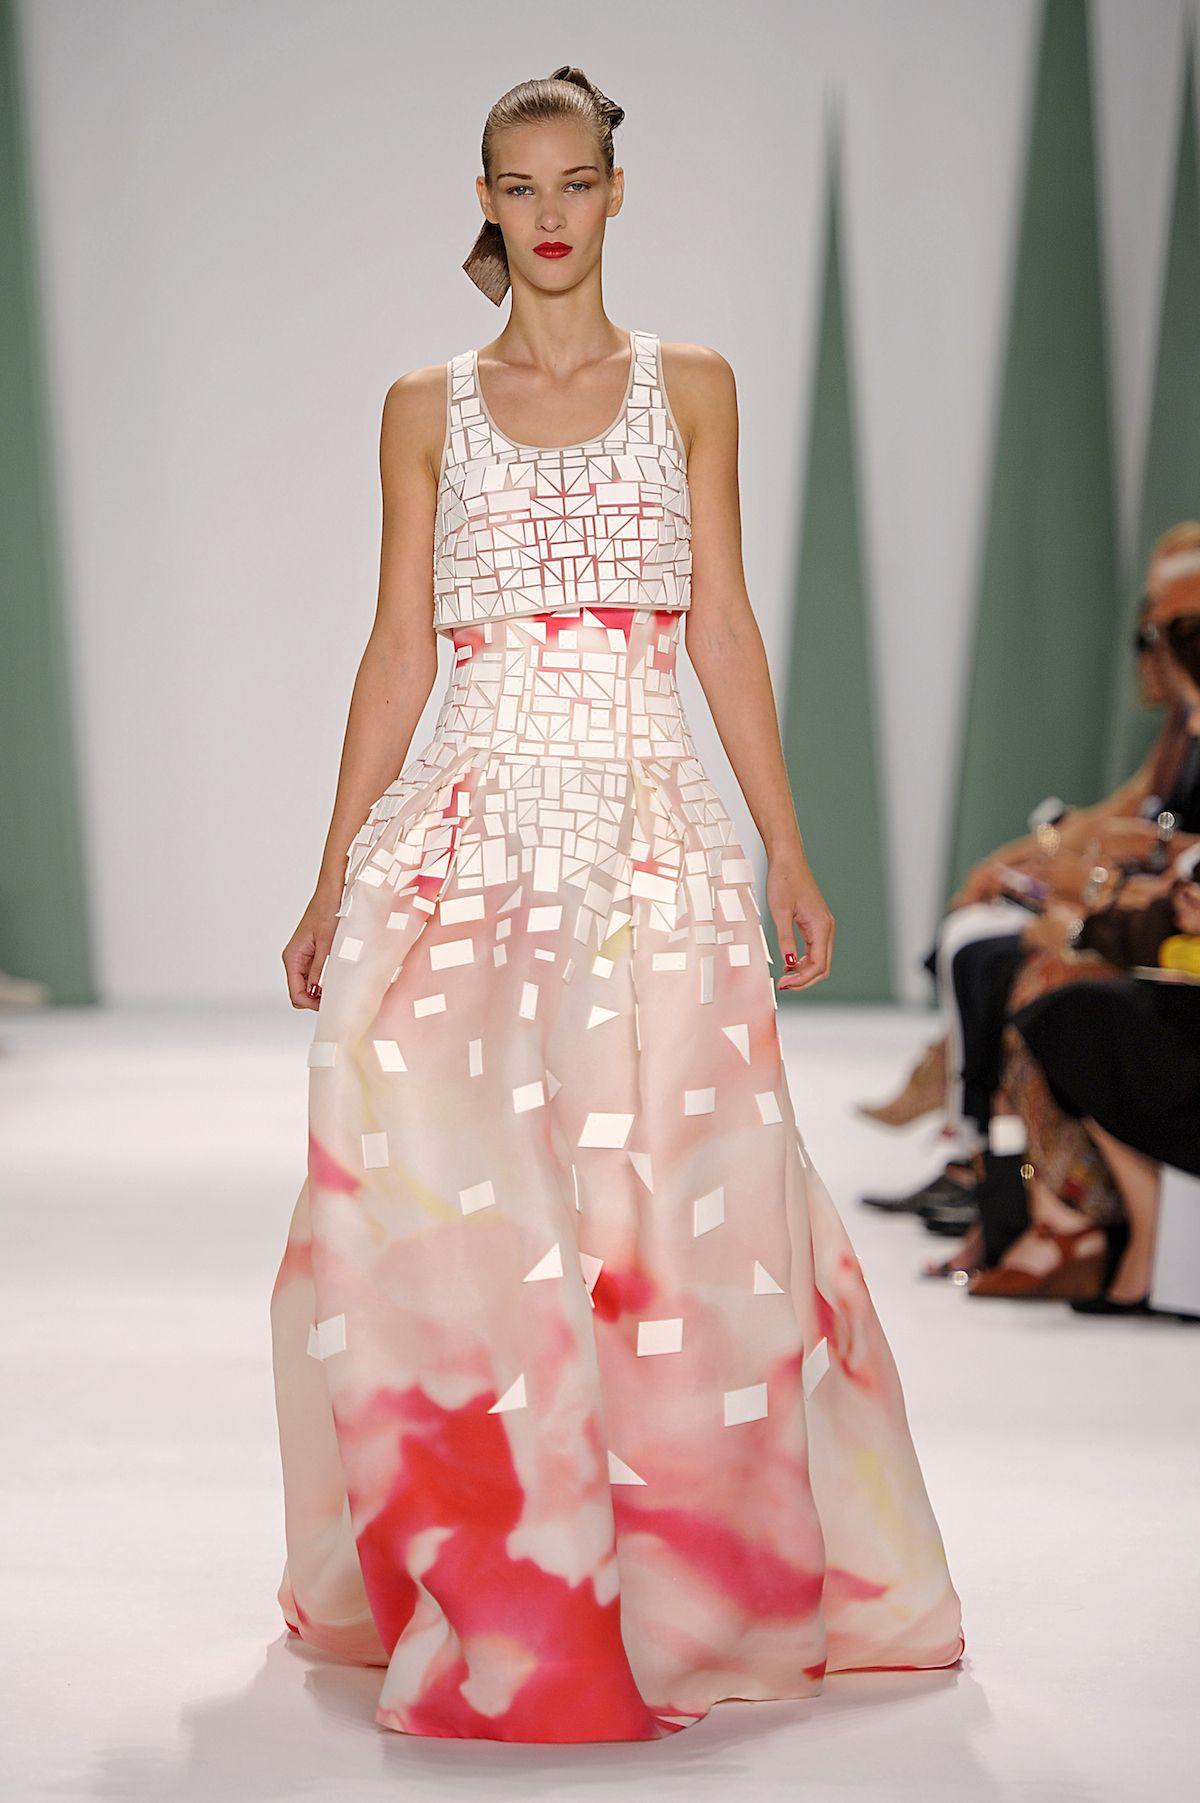 Carolina Herrera Spring 2015 | CAROLINA HERRERA | Pinterest ...